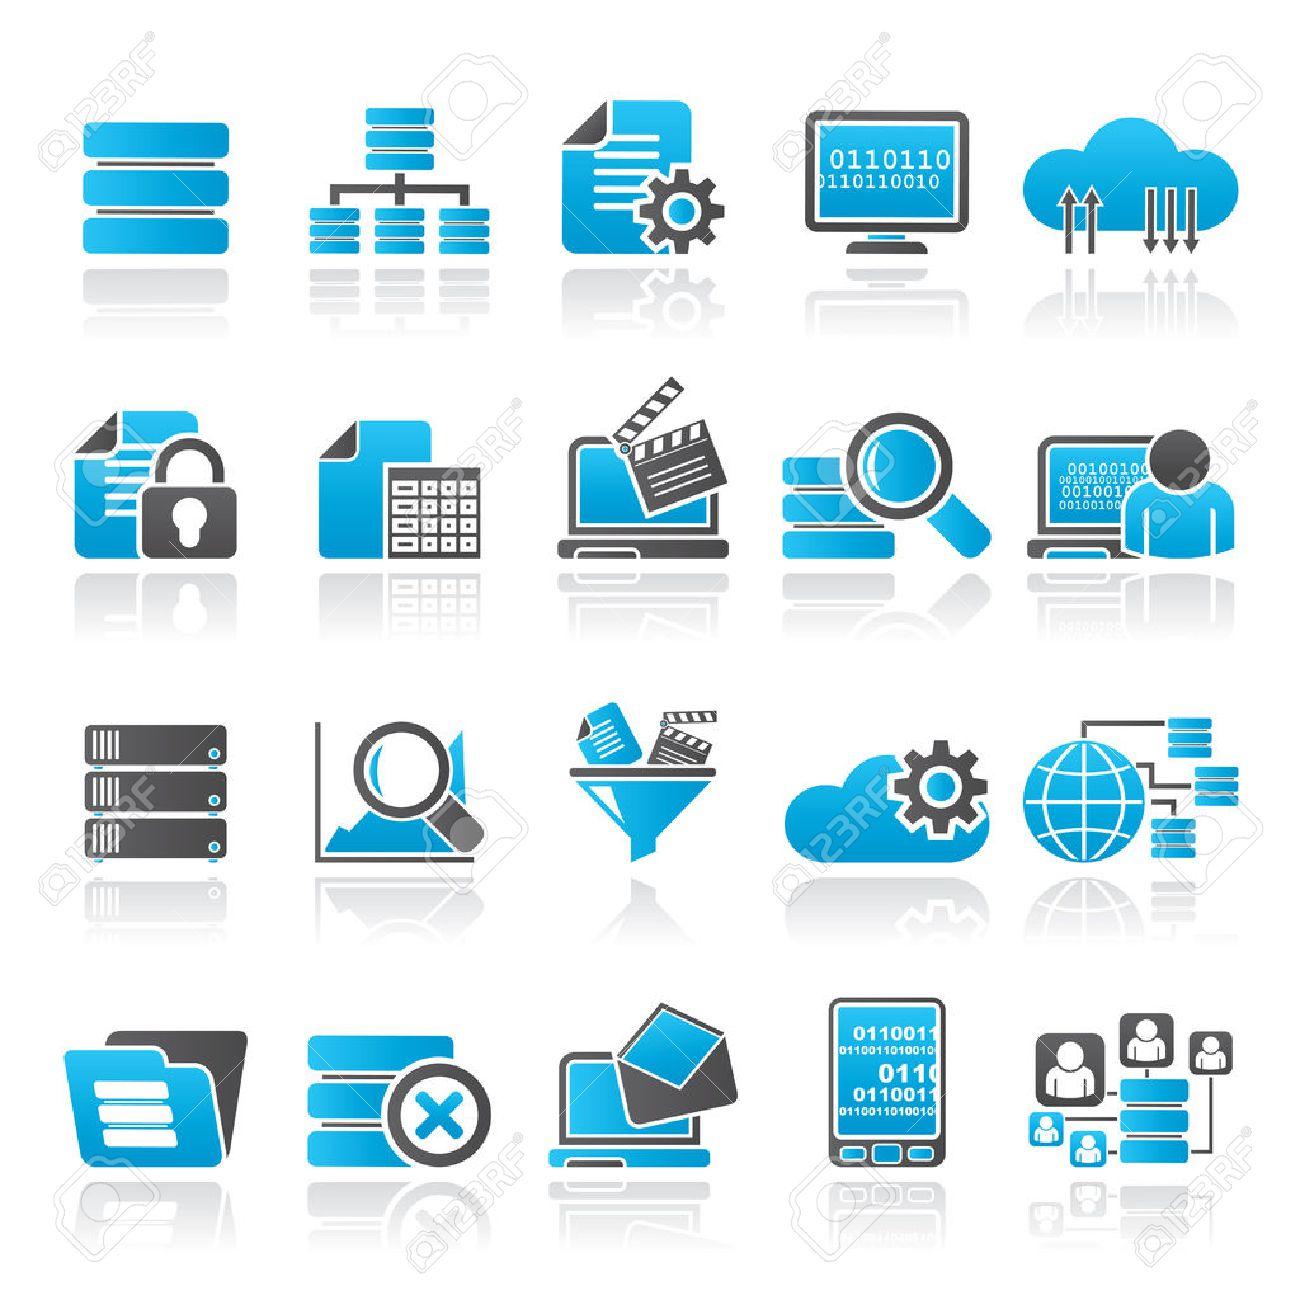 data and analytics icons - vector icon set - 34007694